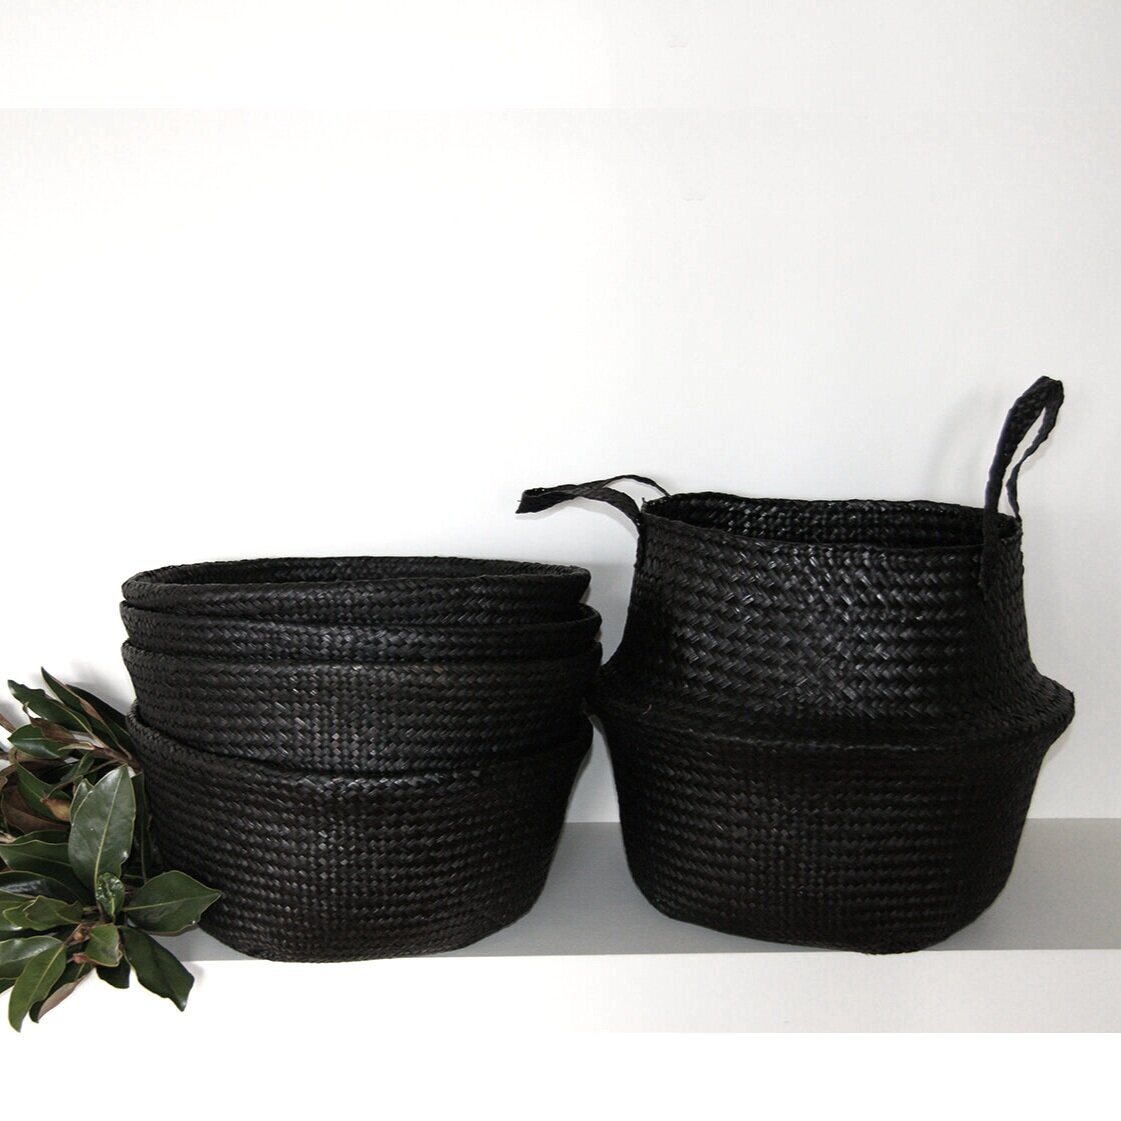 black+baskets+.jpg